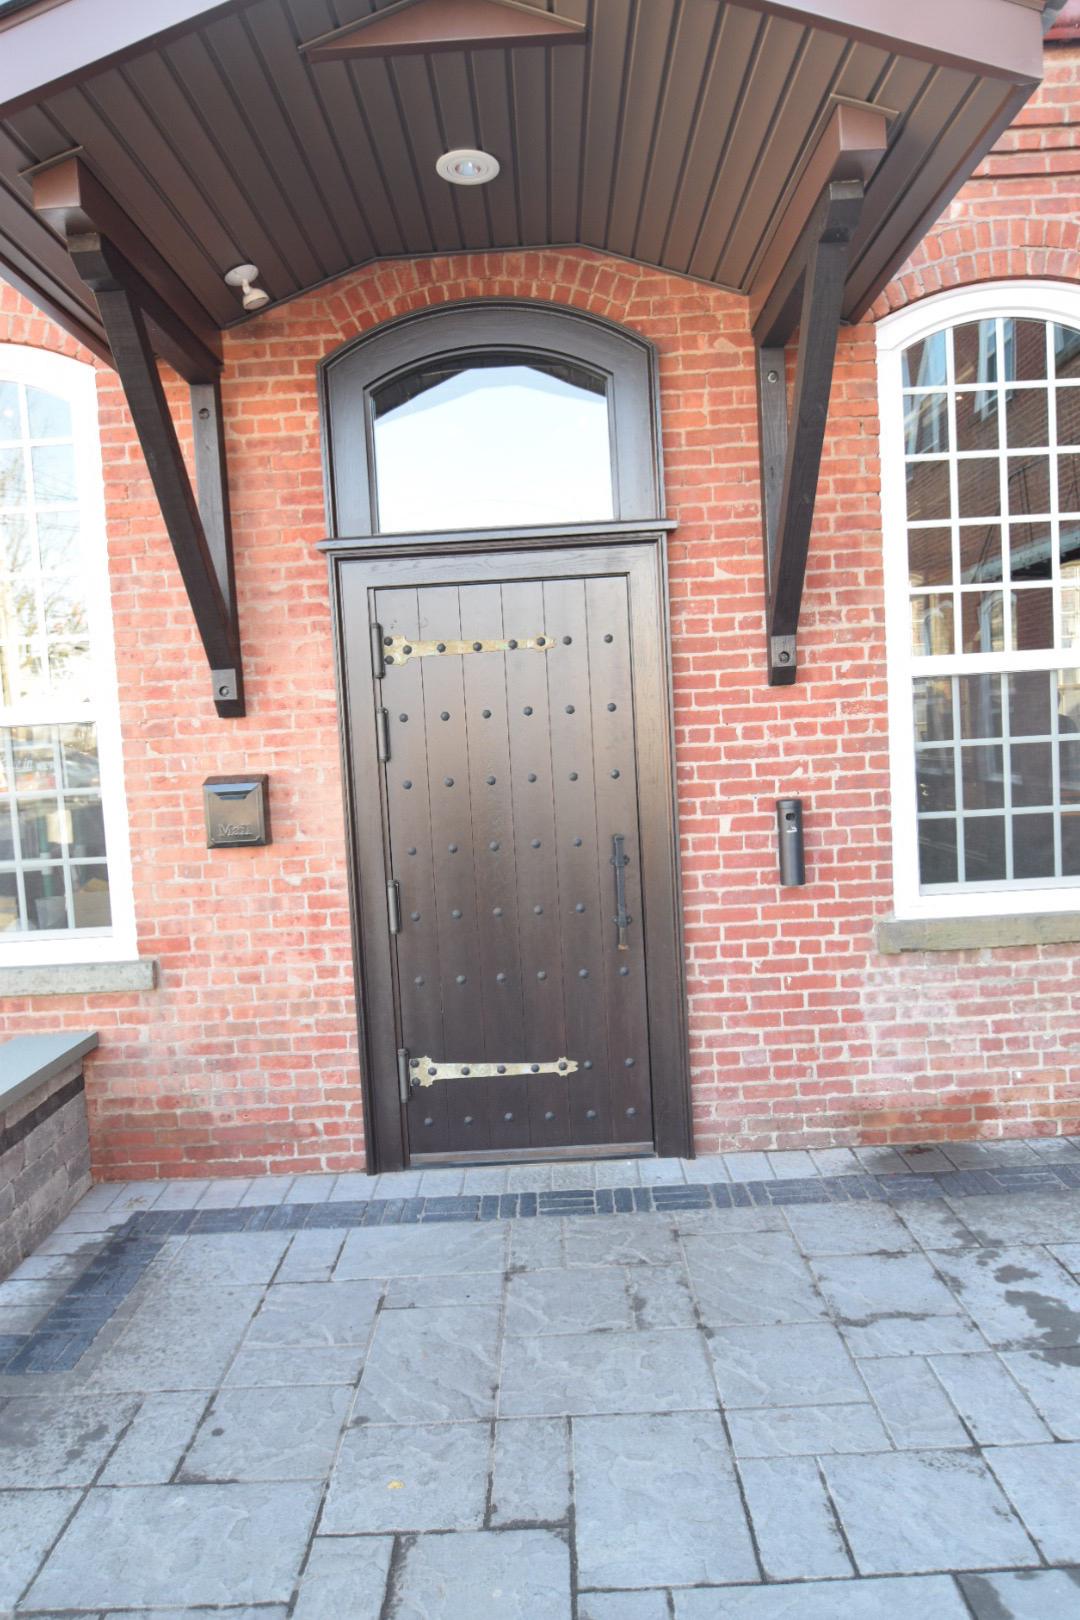 white-oak-door-and-transom-clemson-brewing-middletown-ny.jpg